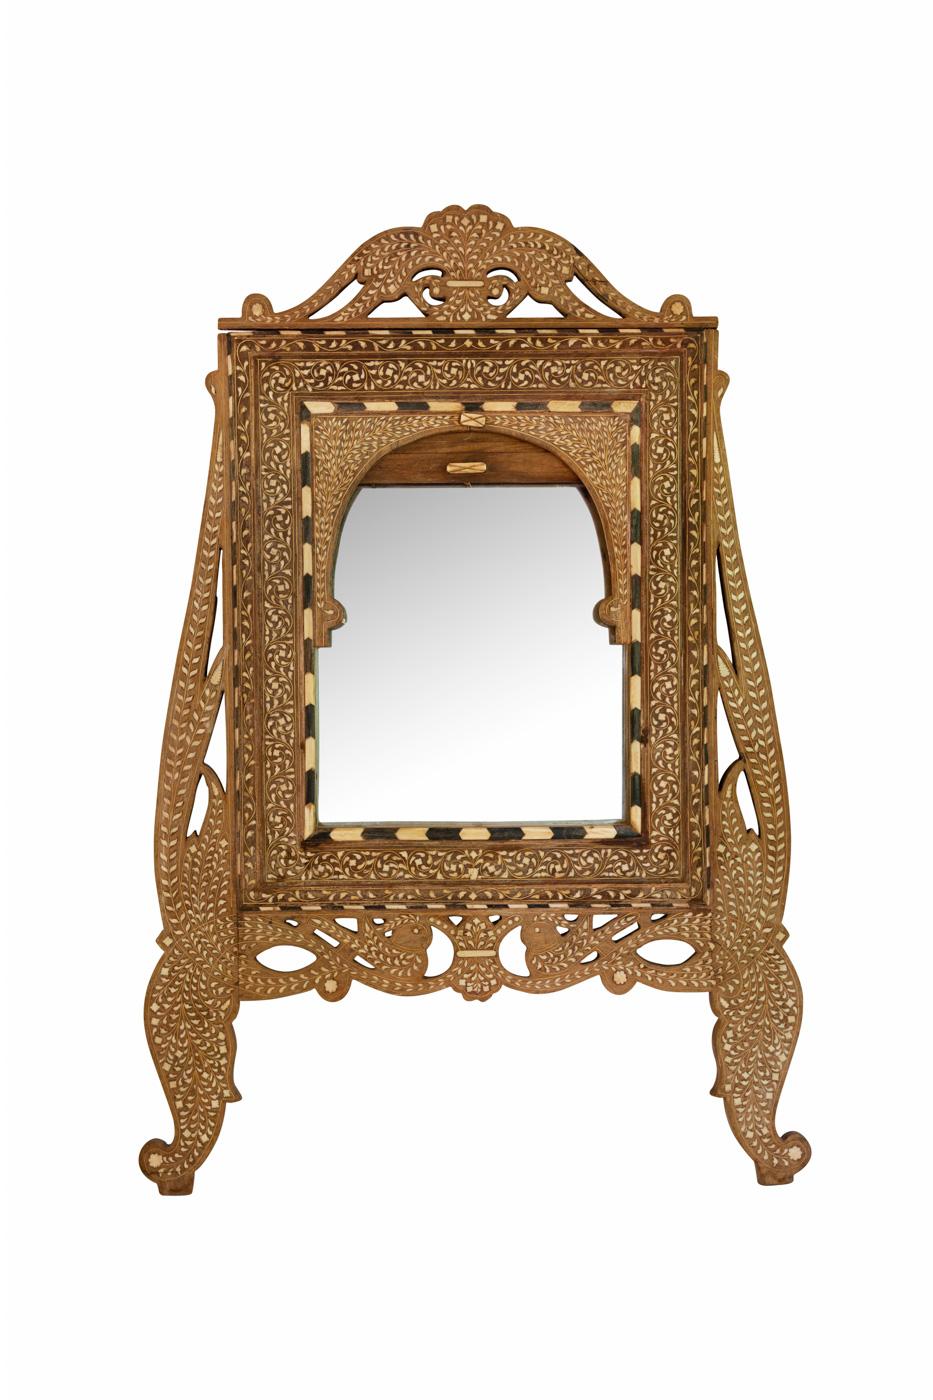 Sirio mirror in wood with bone inlay.